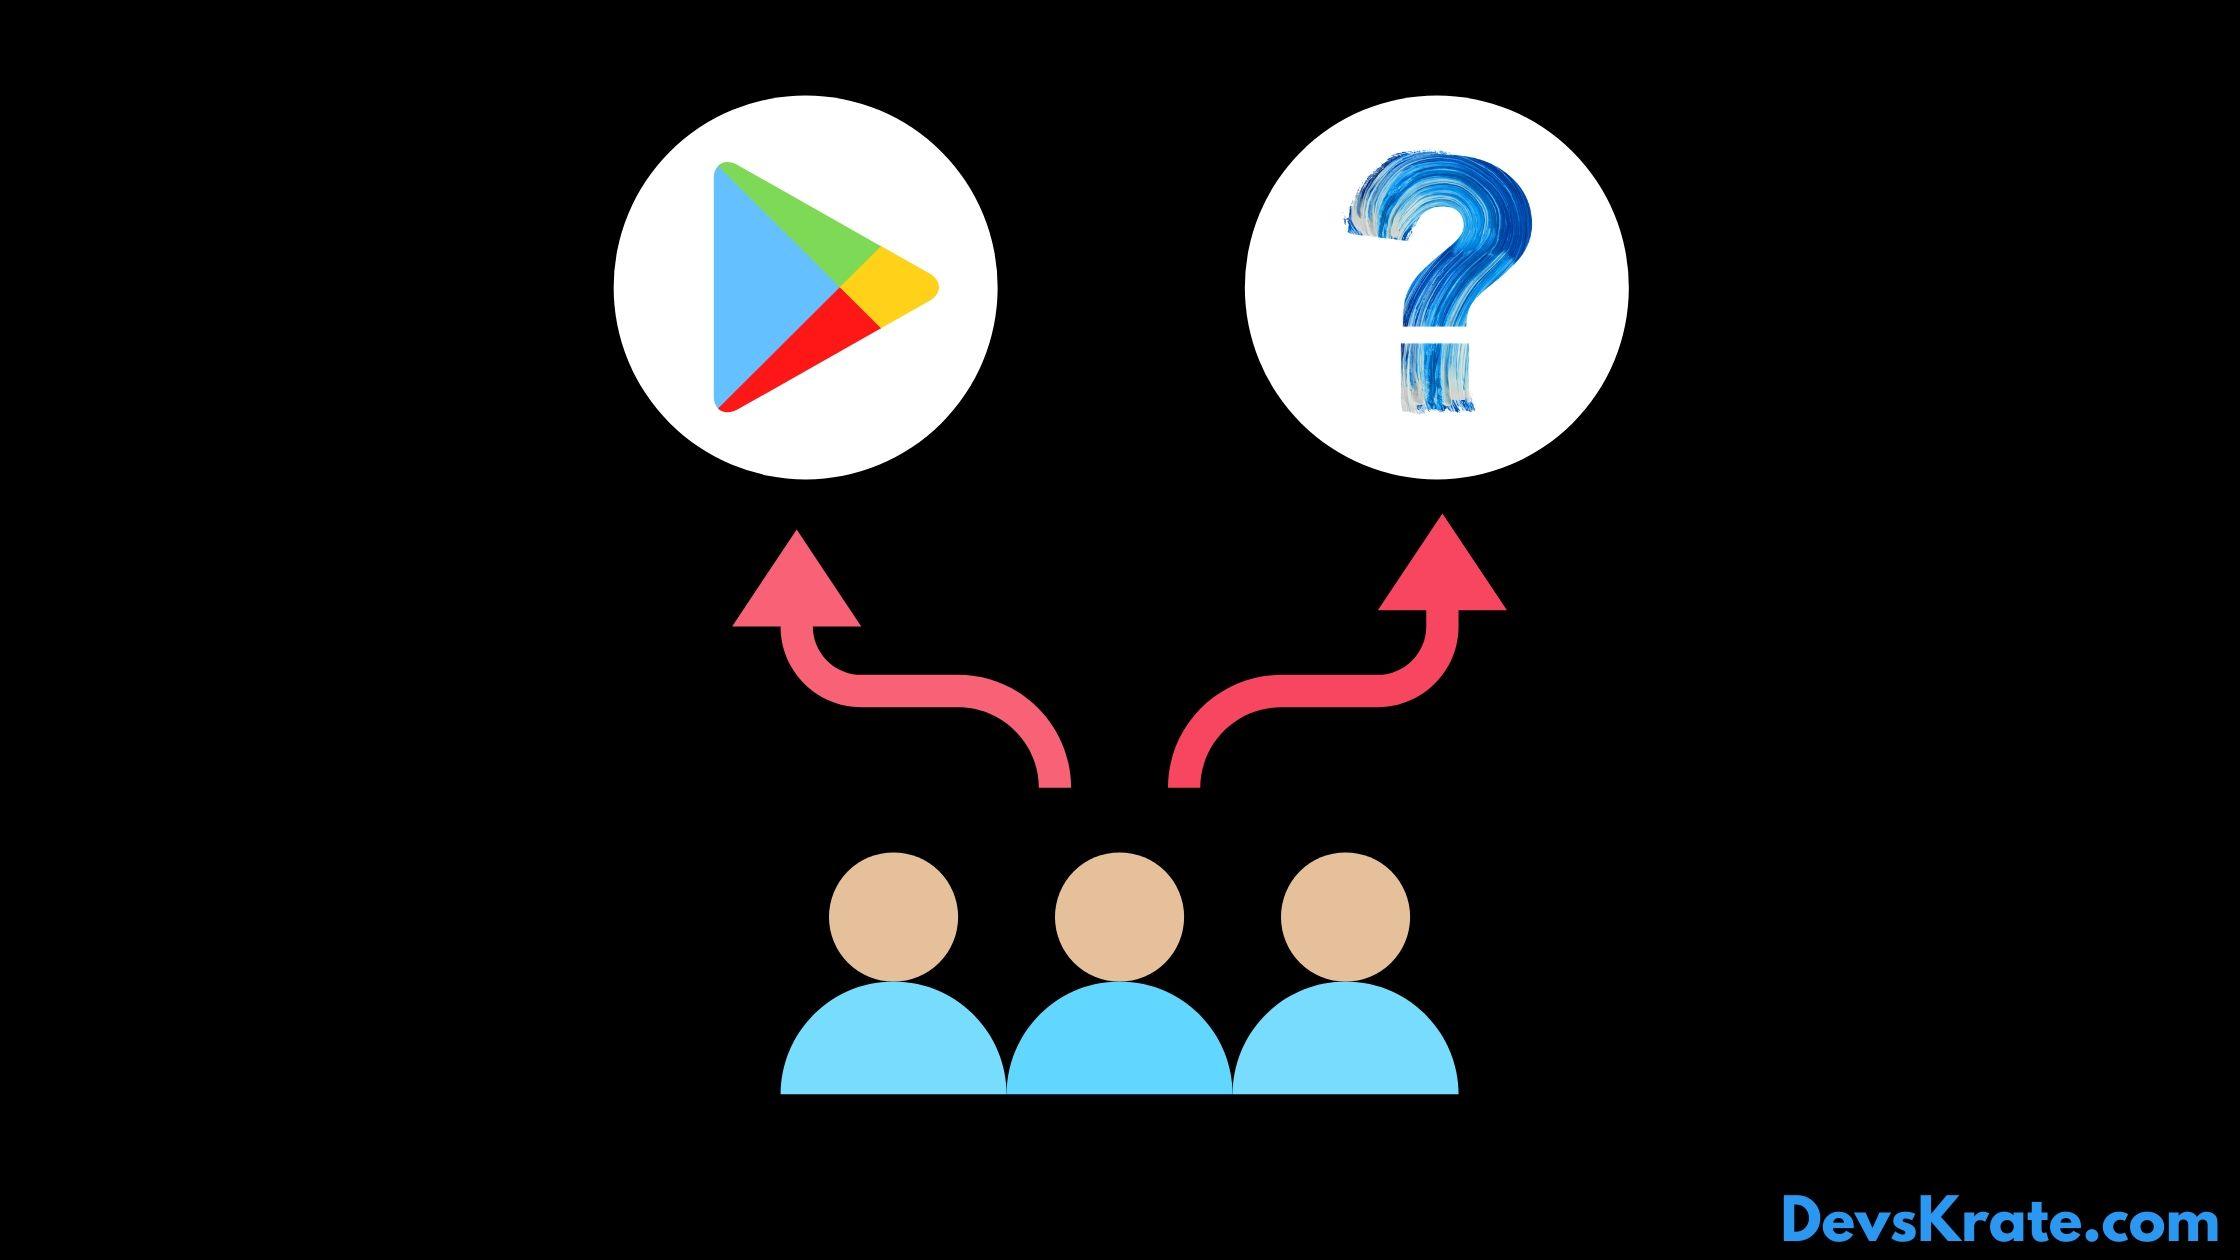 Alternatives of Google play store